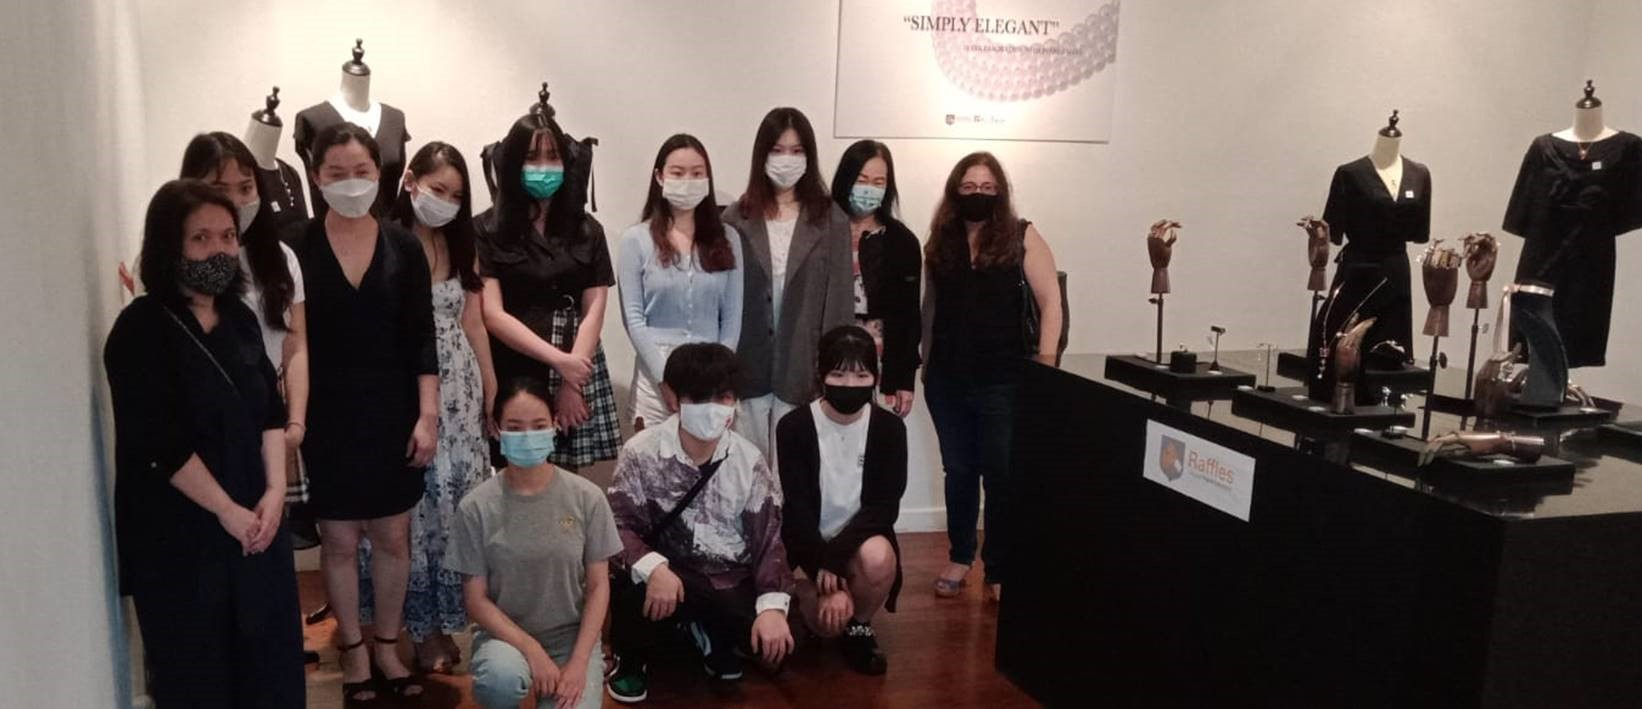 raffles jewellery designers at japan cultural center